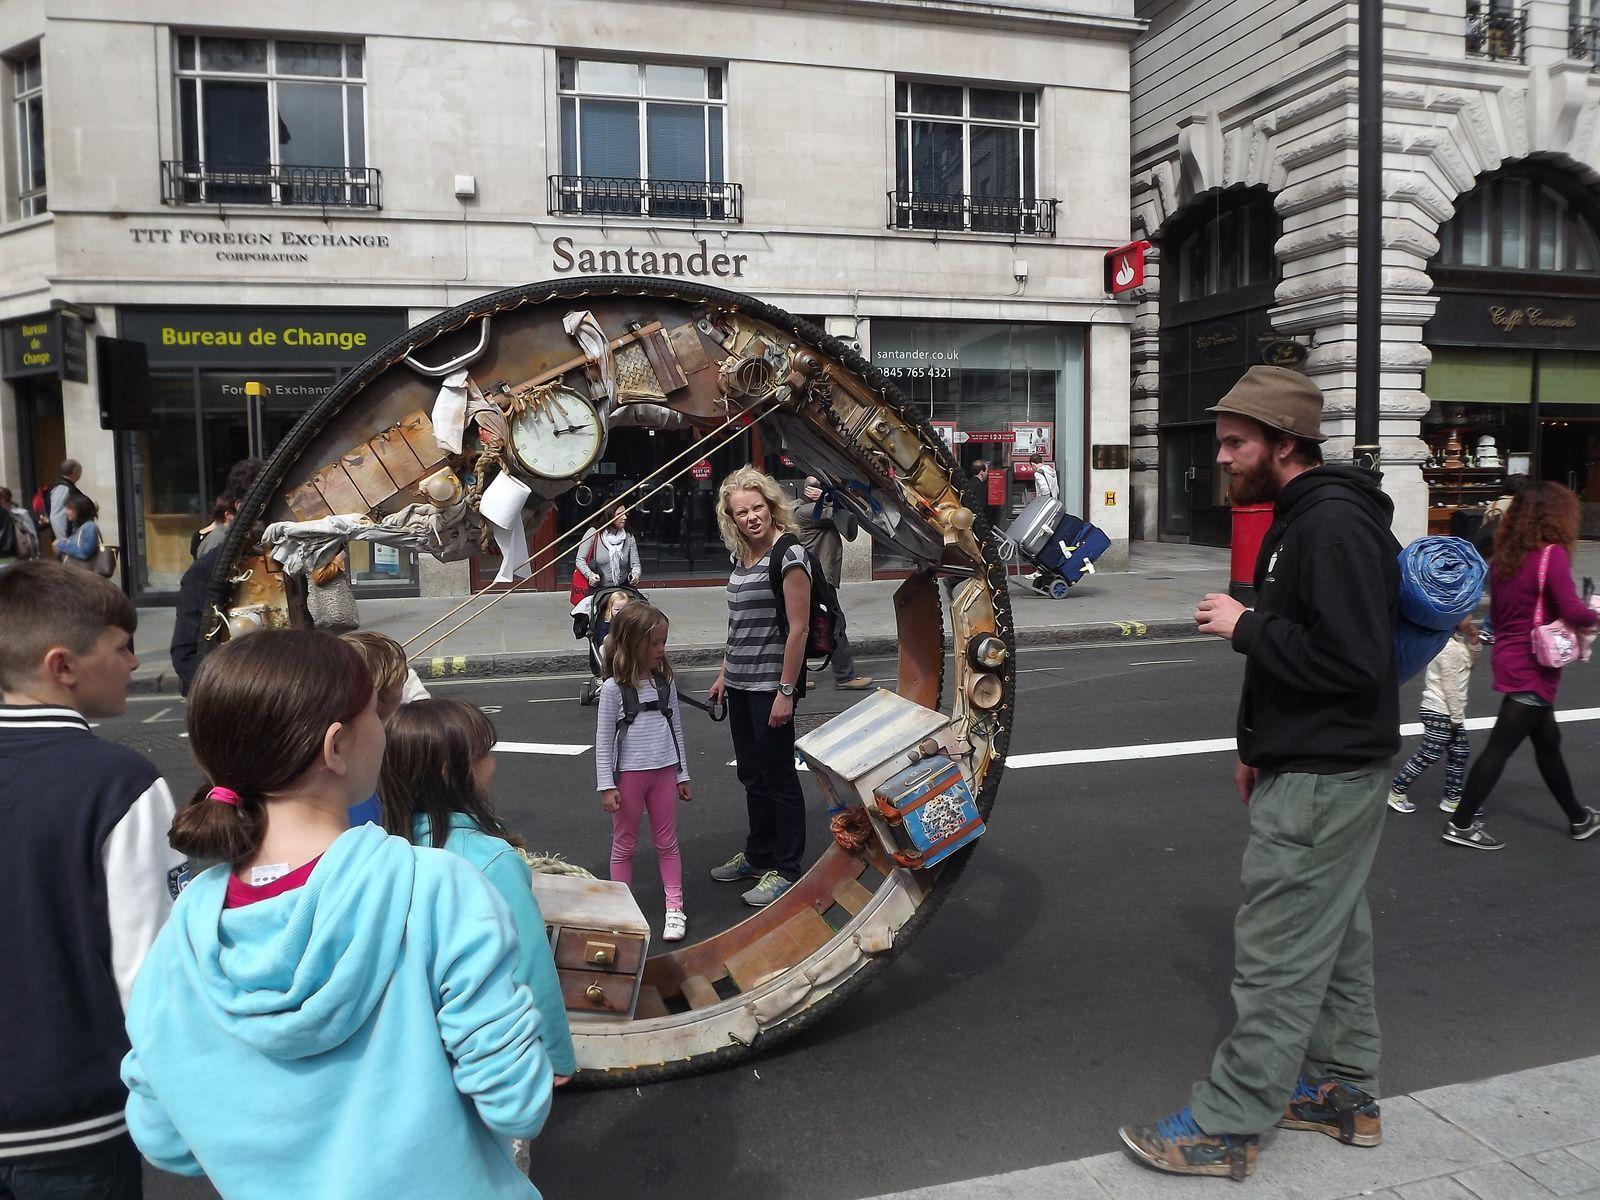 ACROJOU a Londres en 2012